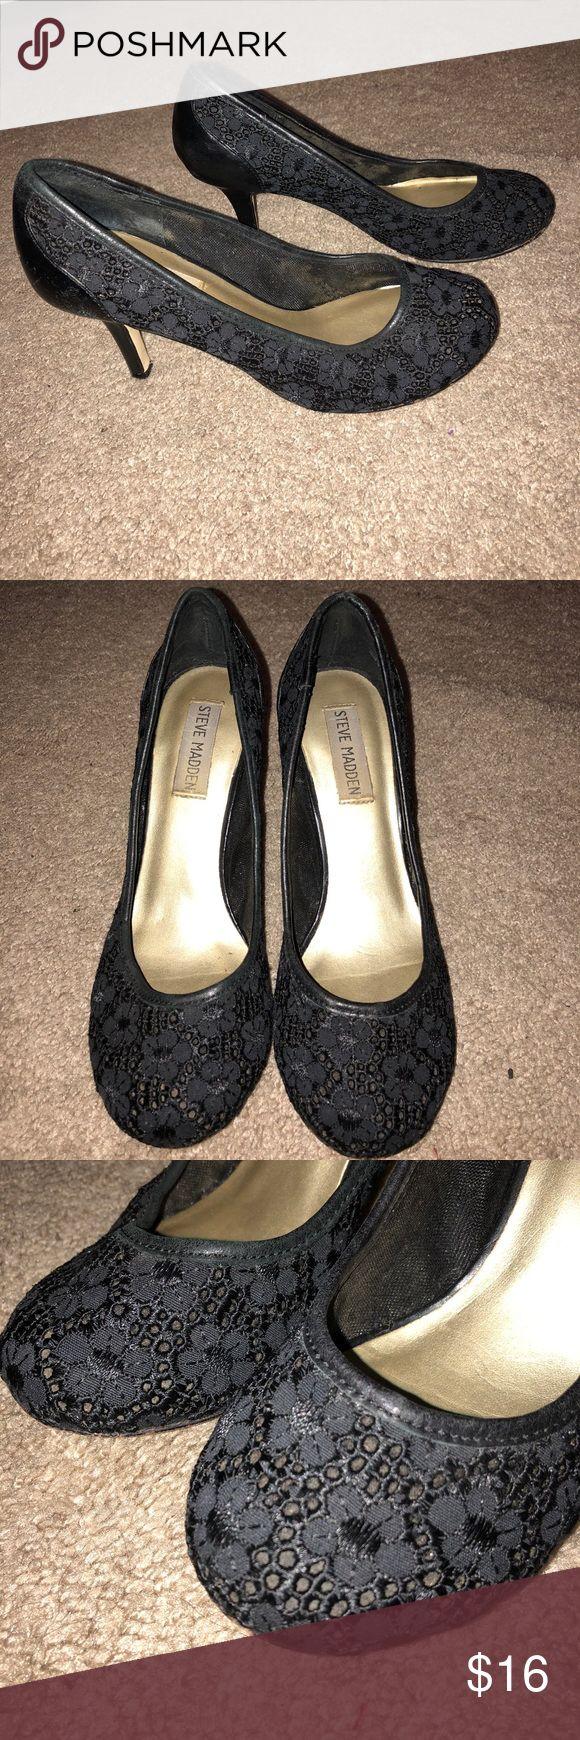 Steve Madden black Heels Lace designed  Leather back  Some scratches on the heel Steve Madden Shoes Heels